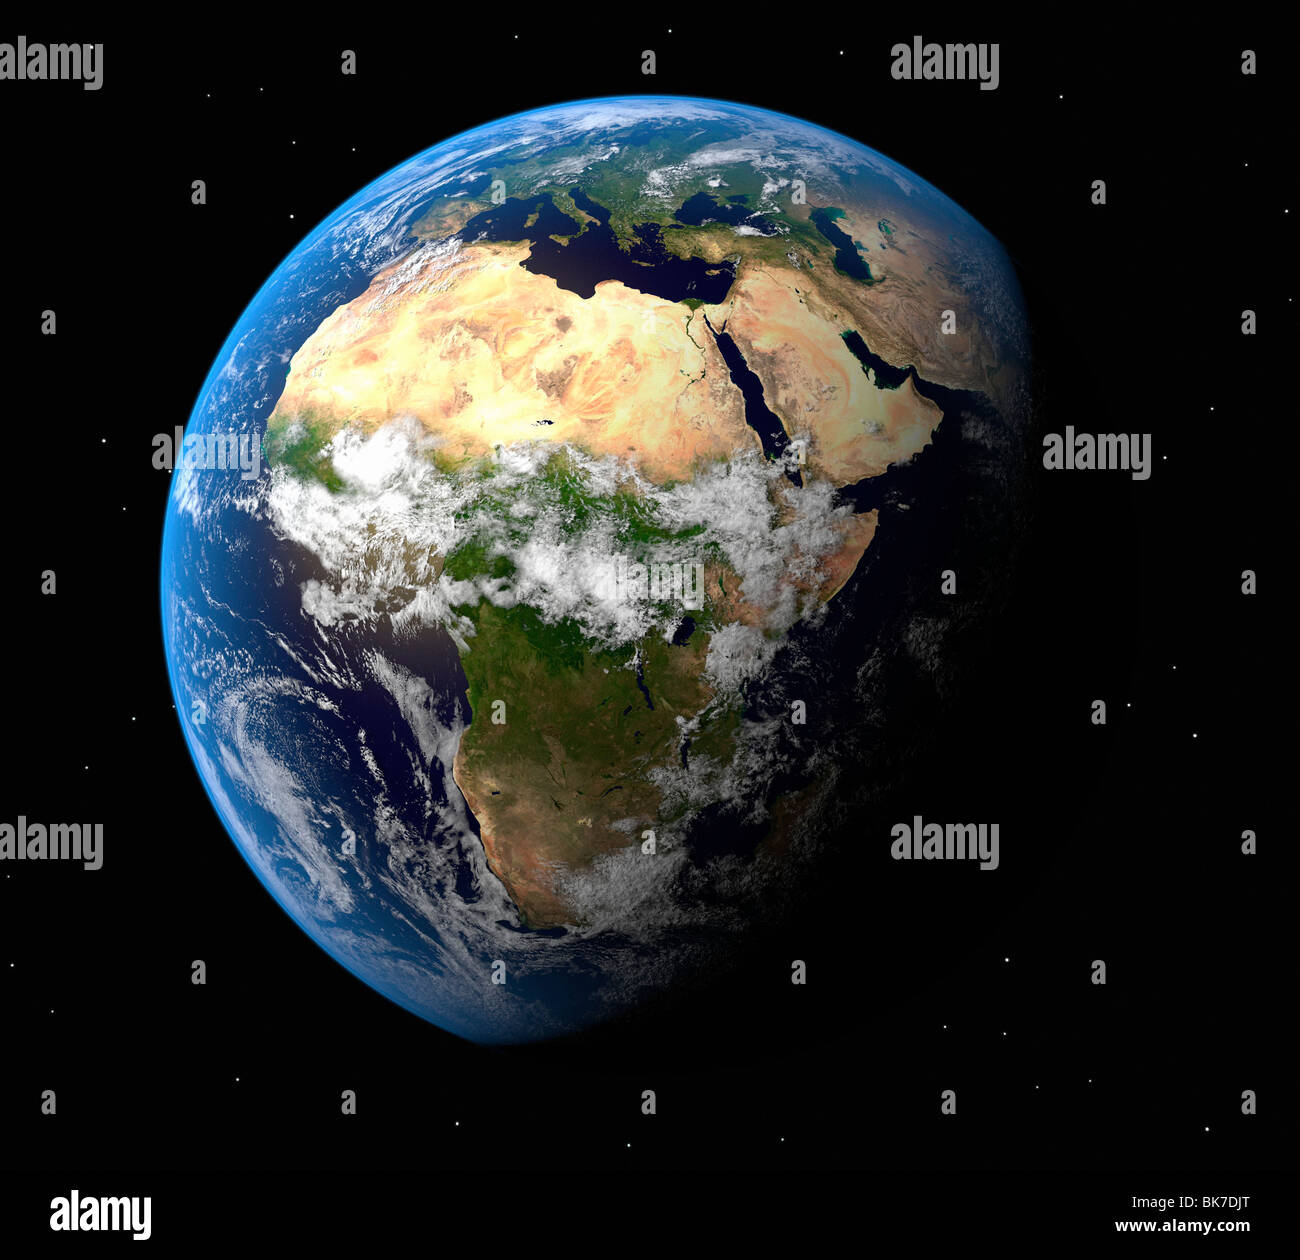 Earth, artwork - Stock Image